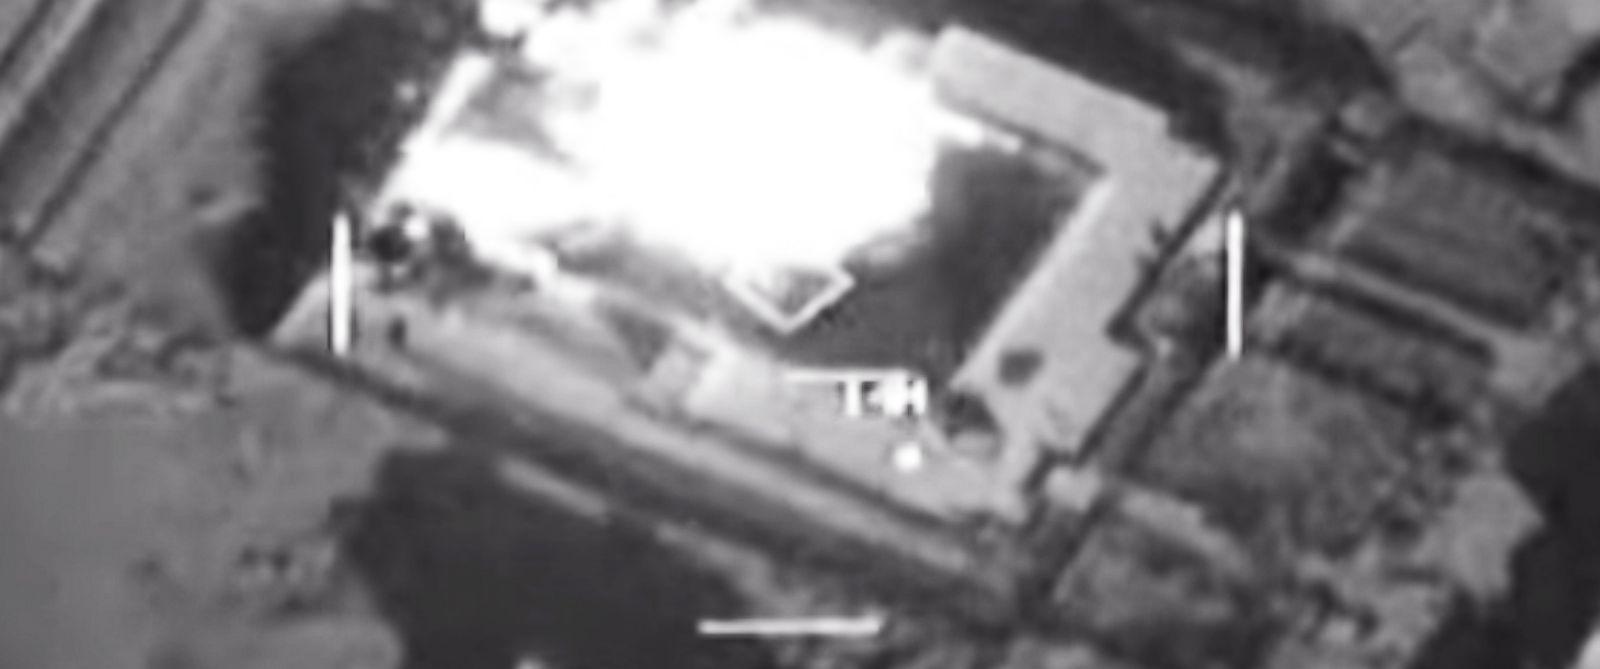 PHOTO: ISIS storage facility near Abu Kamal, Syria, struck by U.S. strike aircraft Sept. 23, 2014.